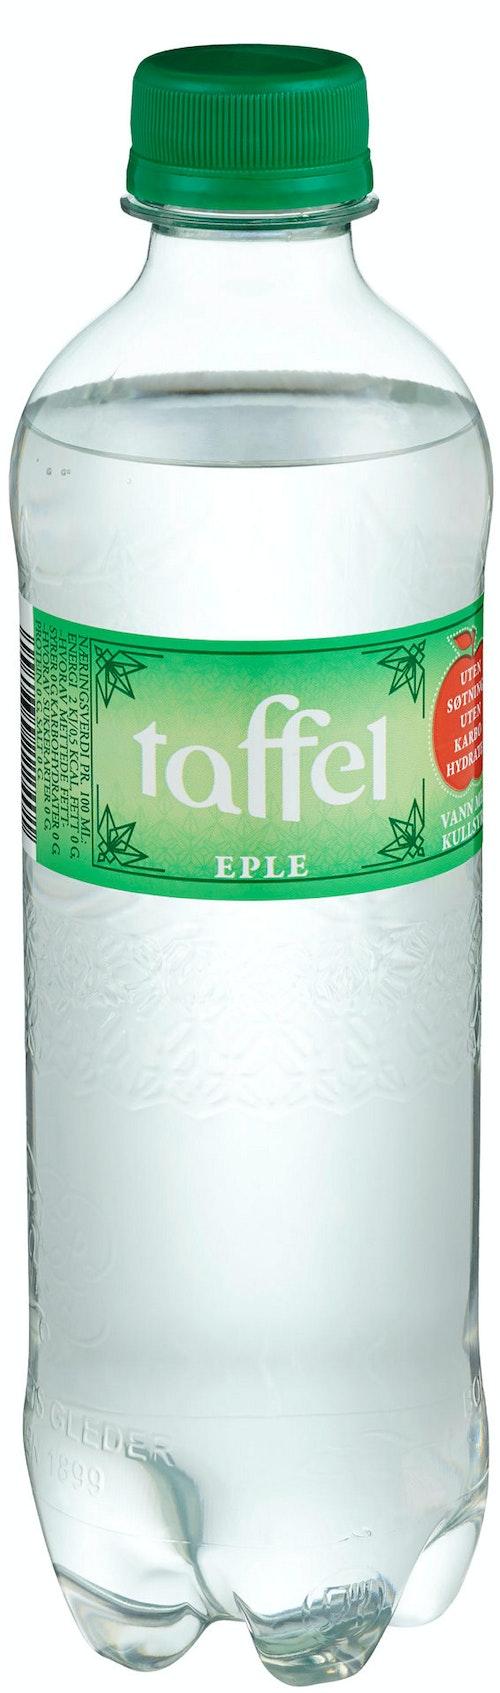 Grans Bryggeri Taffel Eple 0,45 l